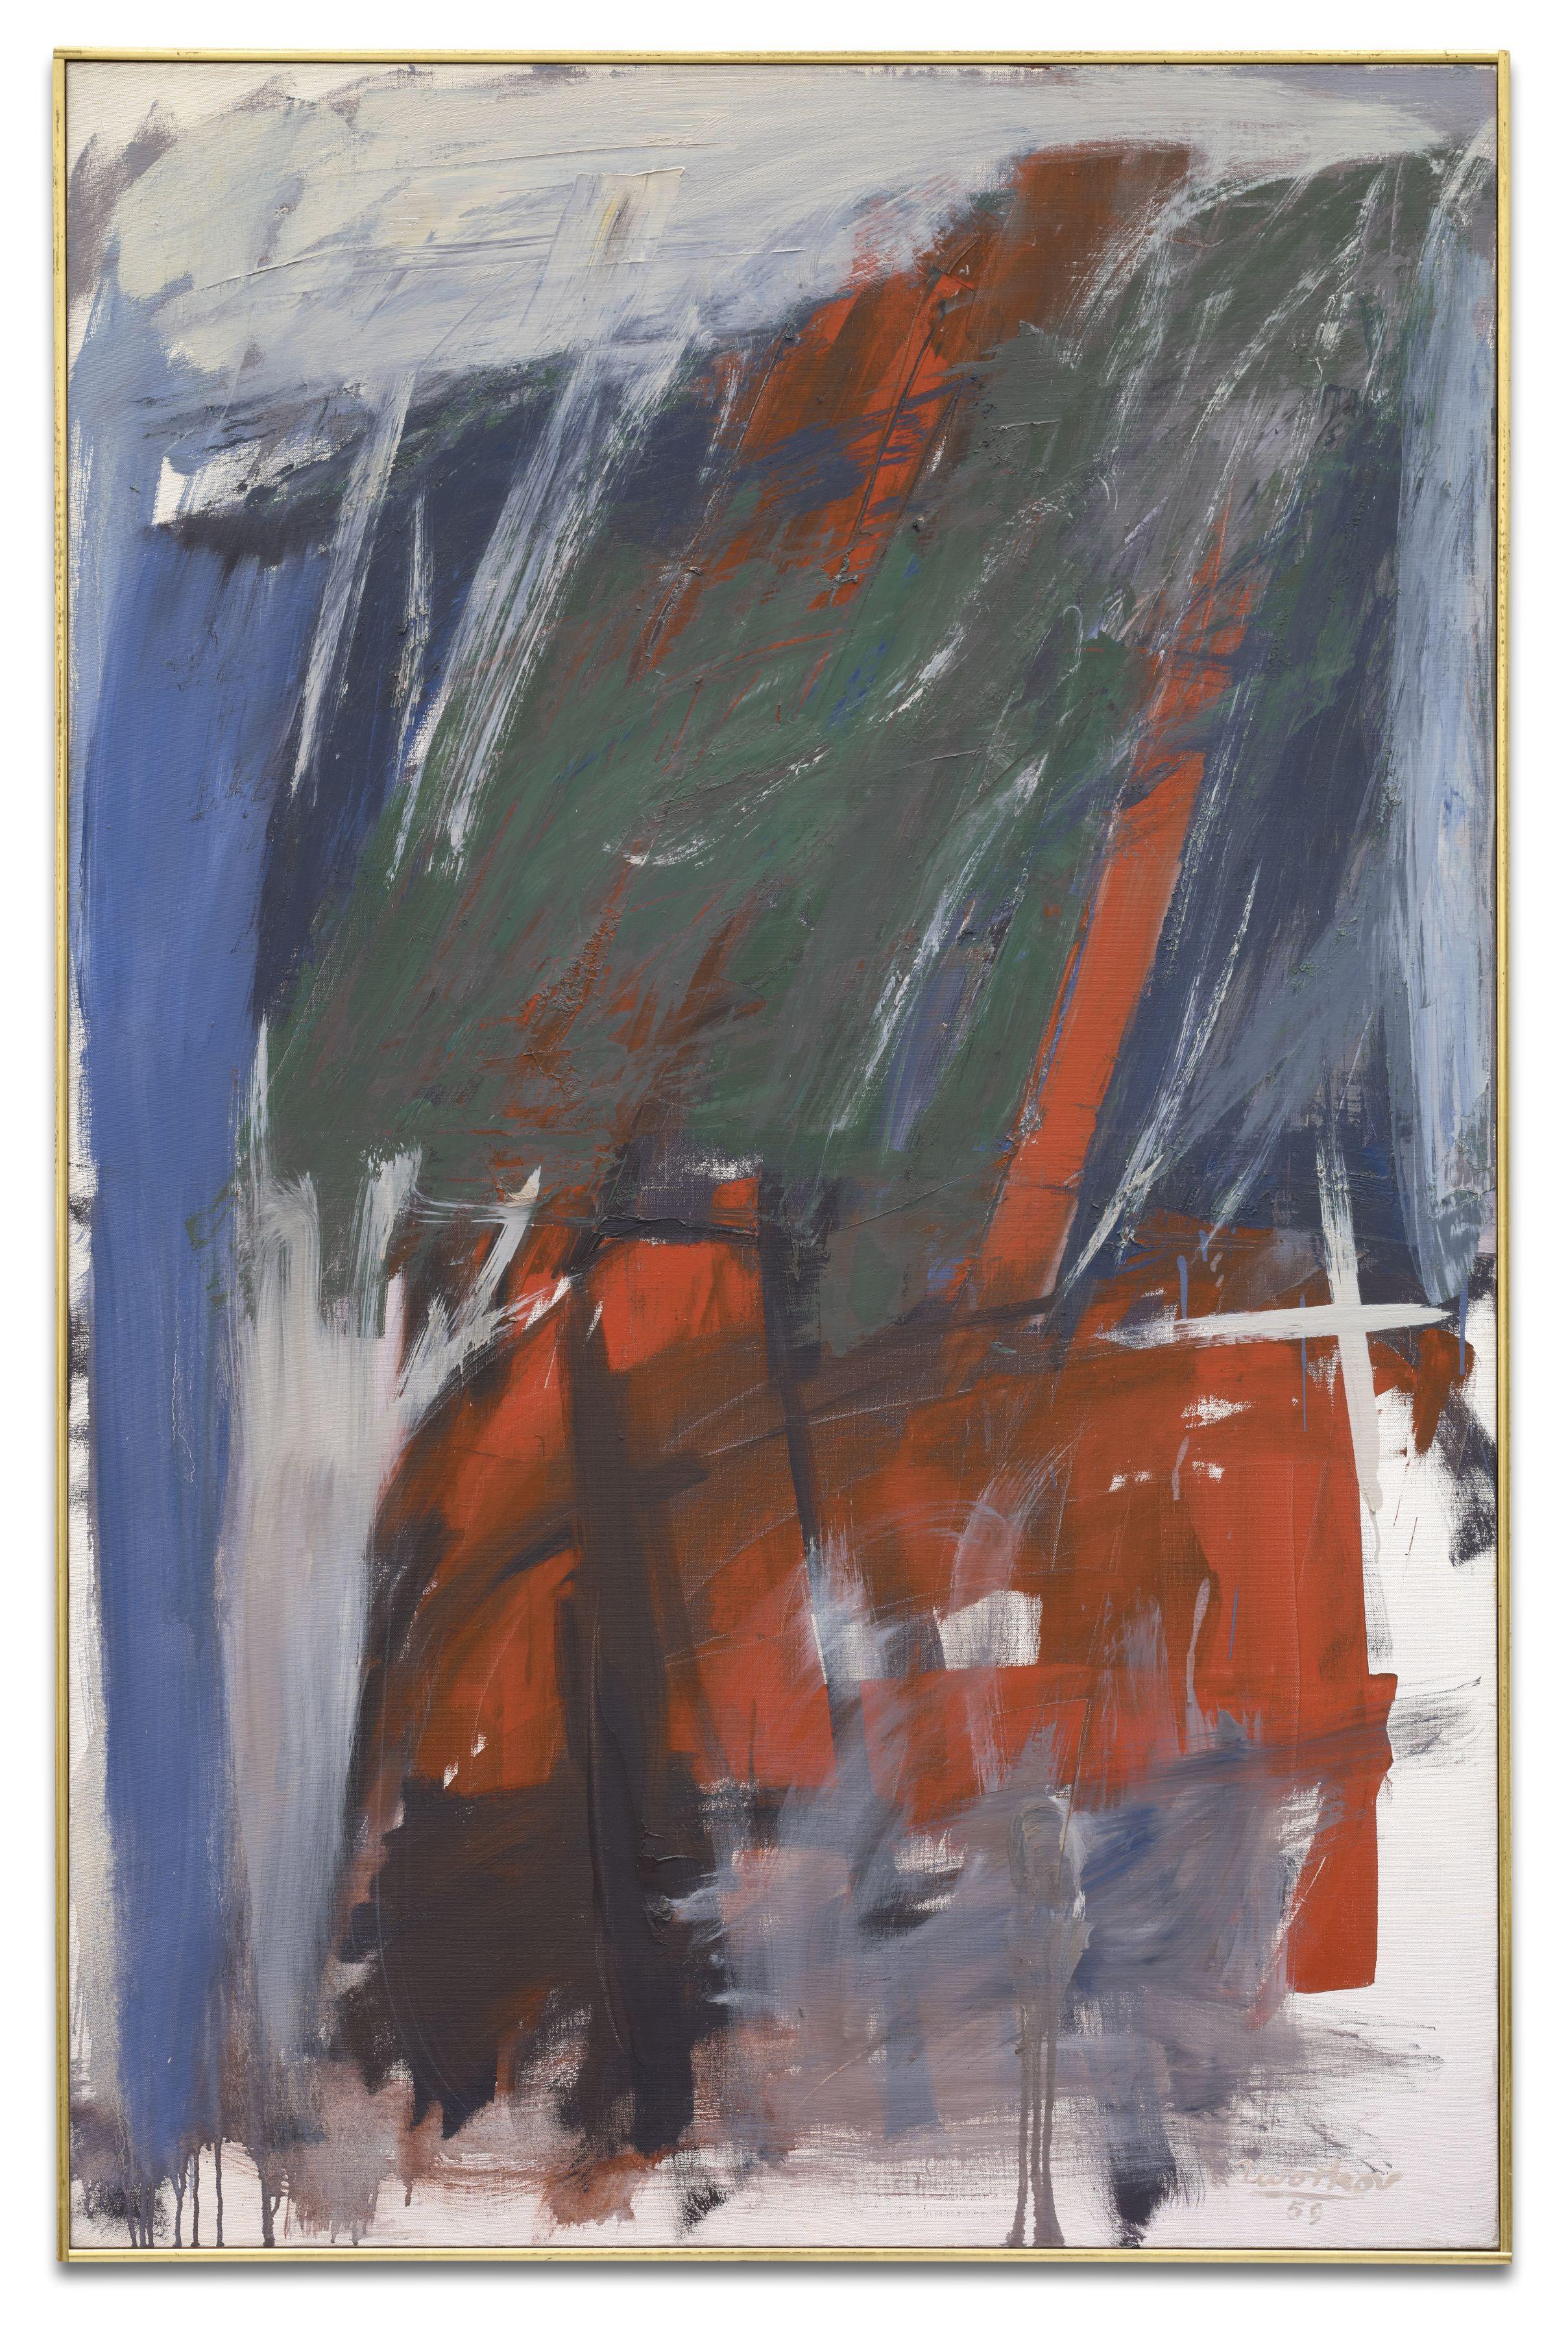 Vulcan, 1959, Oil on canvas